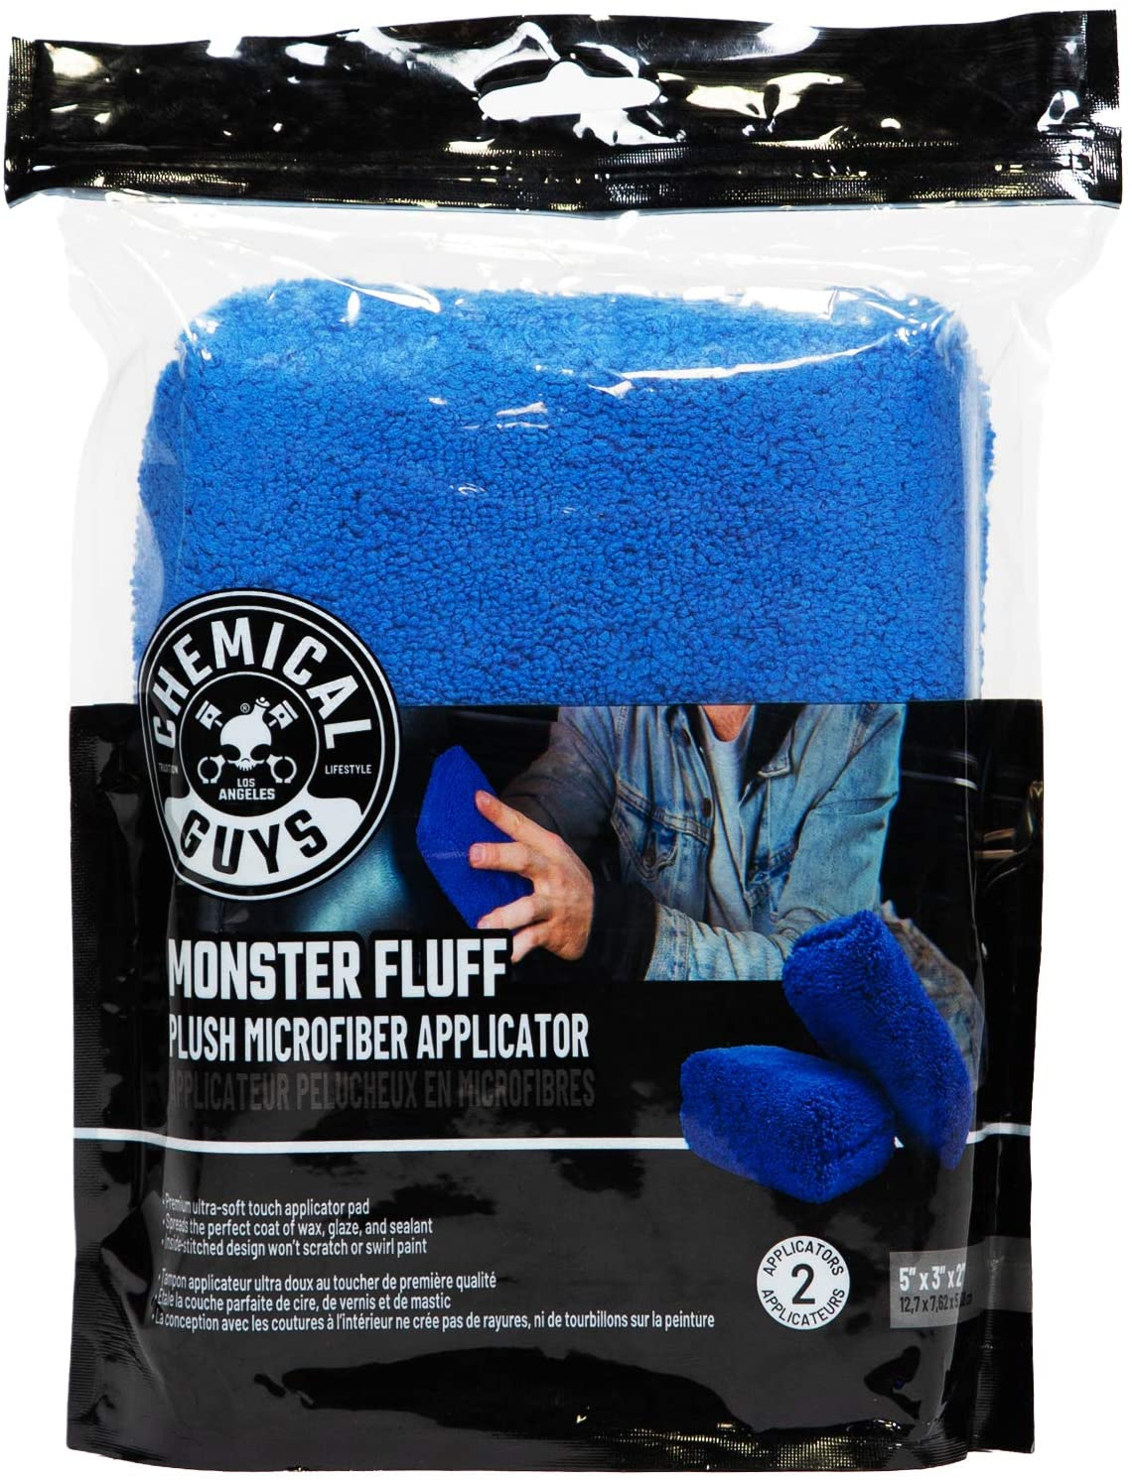 Chemical Guys Mic28602 Außen Premium Mikrofaser Applikator Blau 2 Stück Monster Fluff Dunkelblau Pack Of 2 Set Of 2 Auto